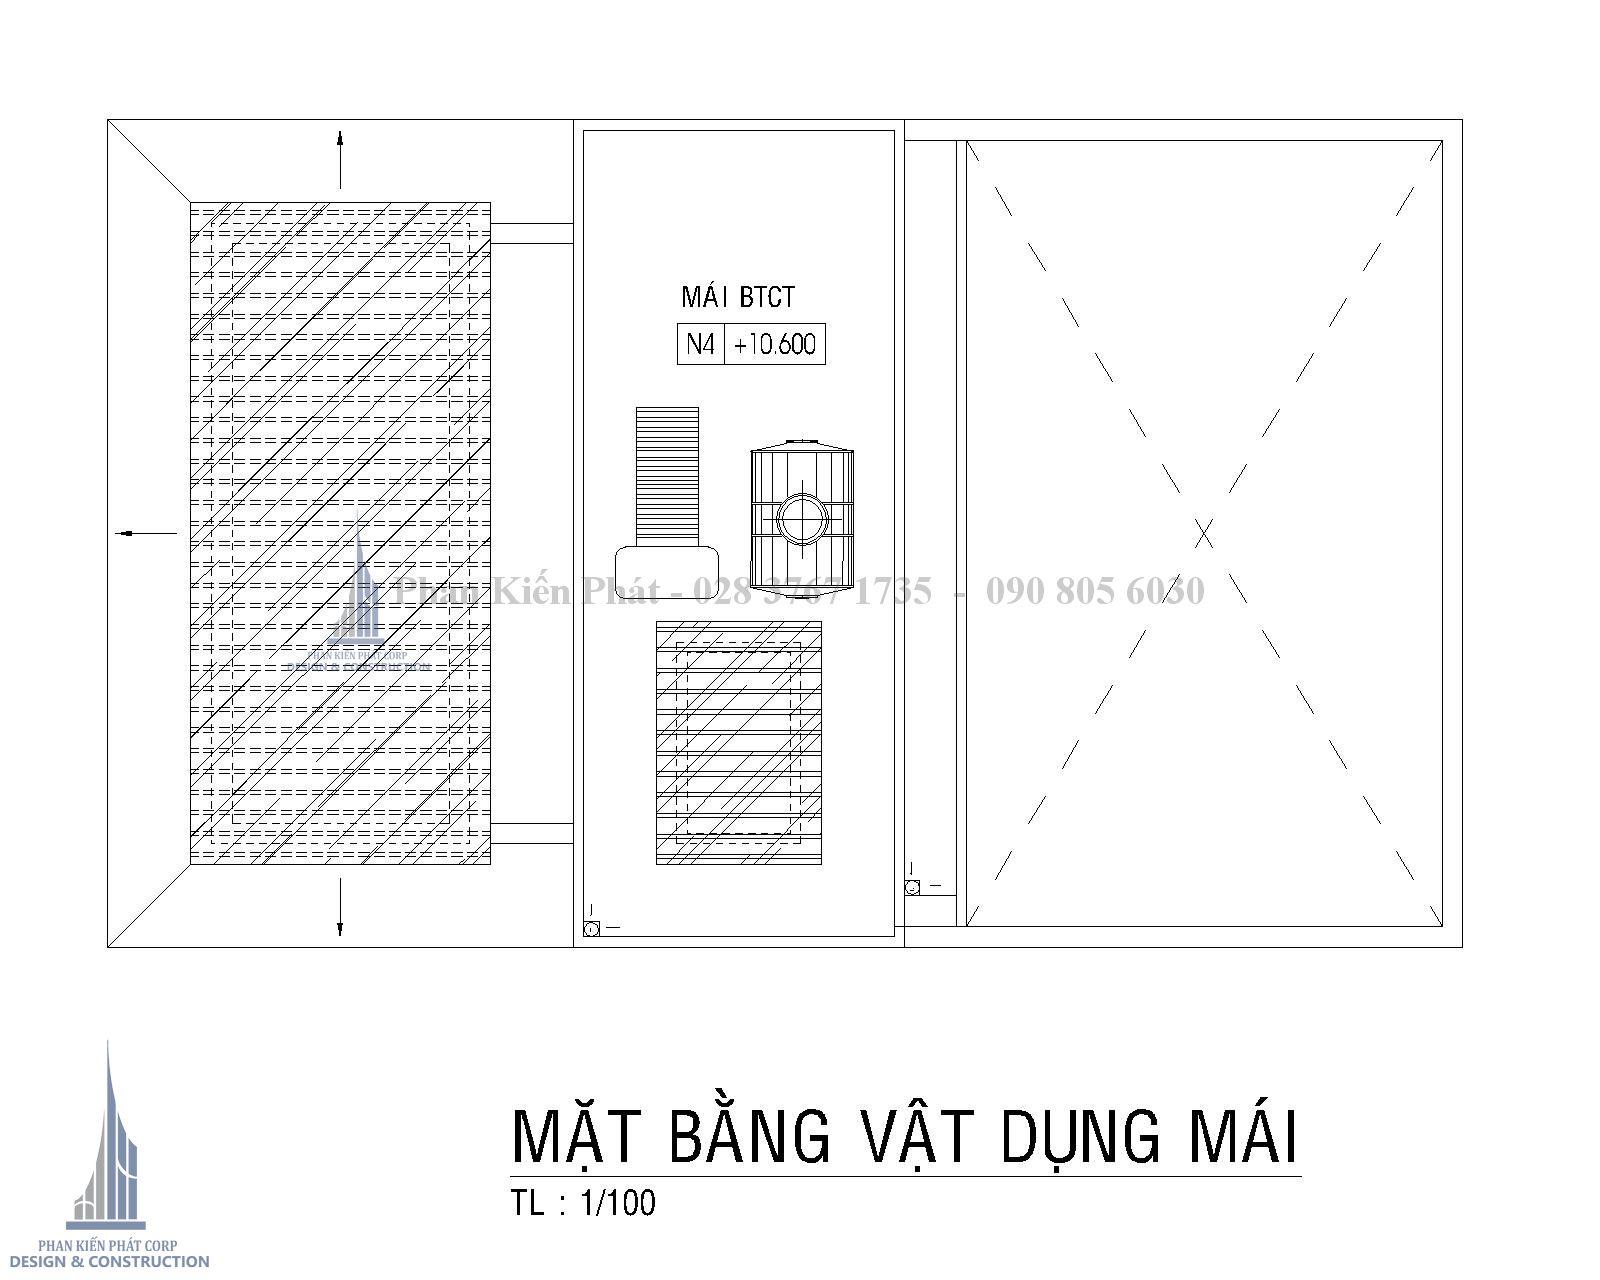 Mat Bang Mai Biet Thu Pho Hien Dai Binh Phuoc